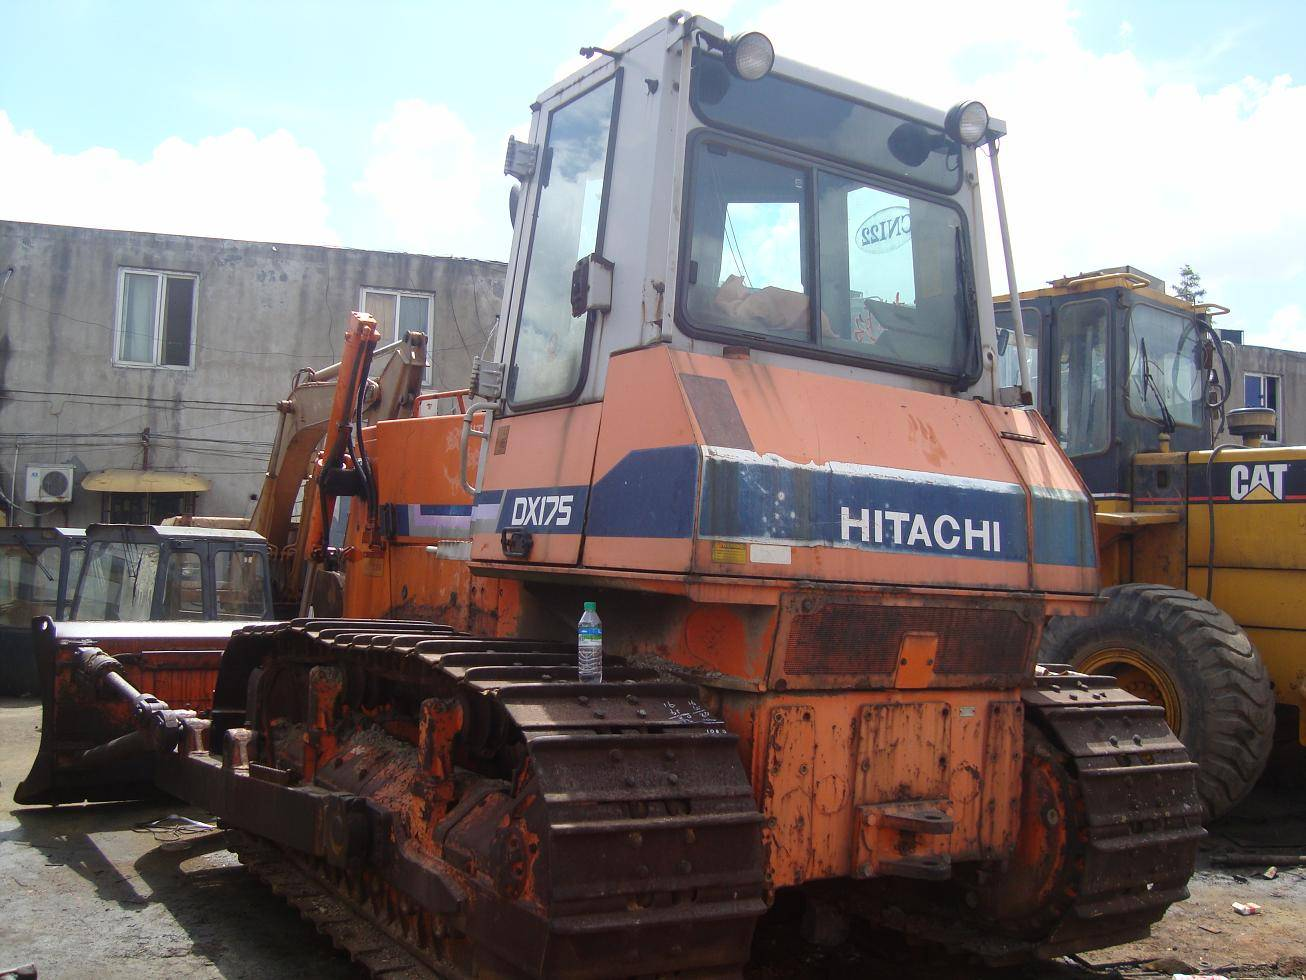 used bulldozer Hitachi DX175